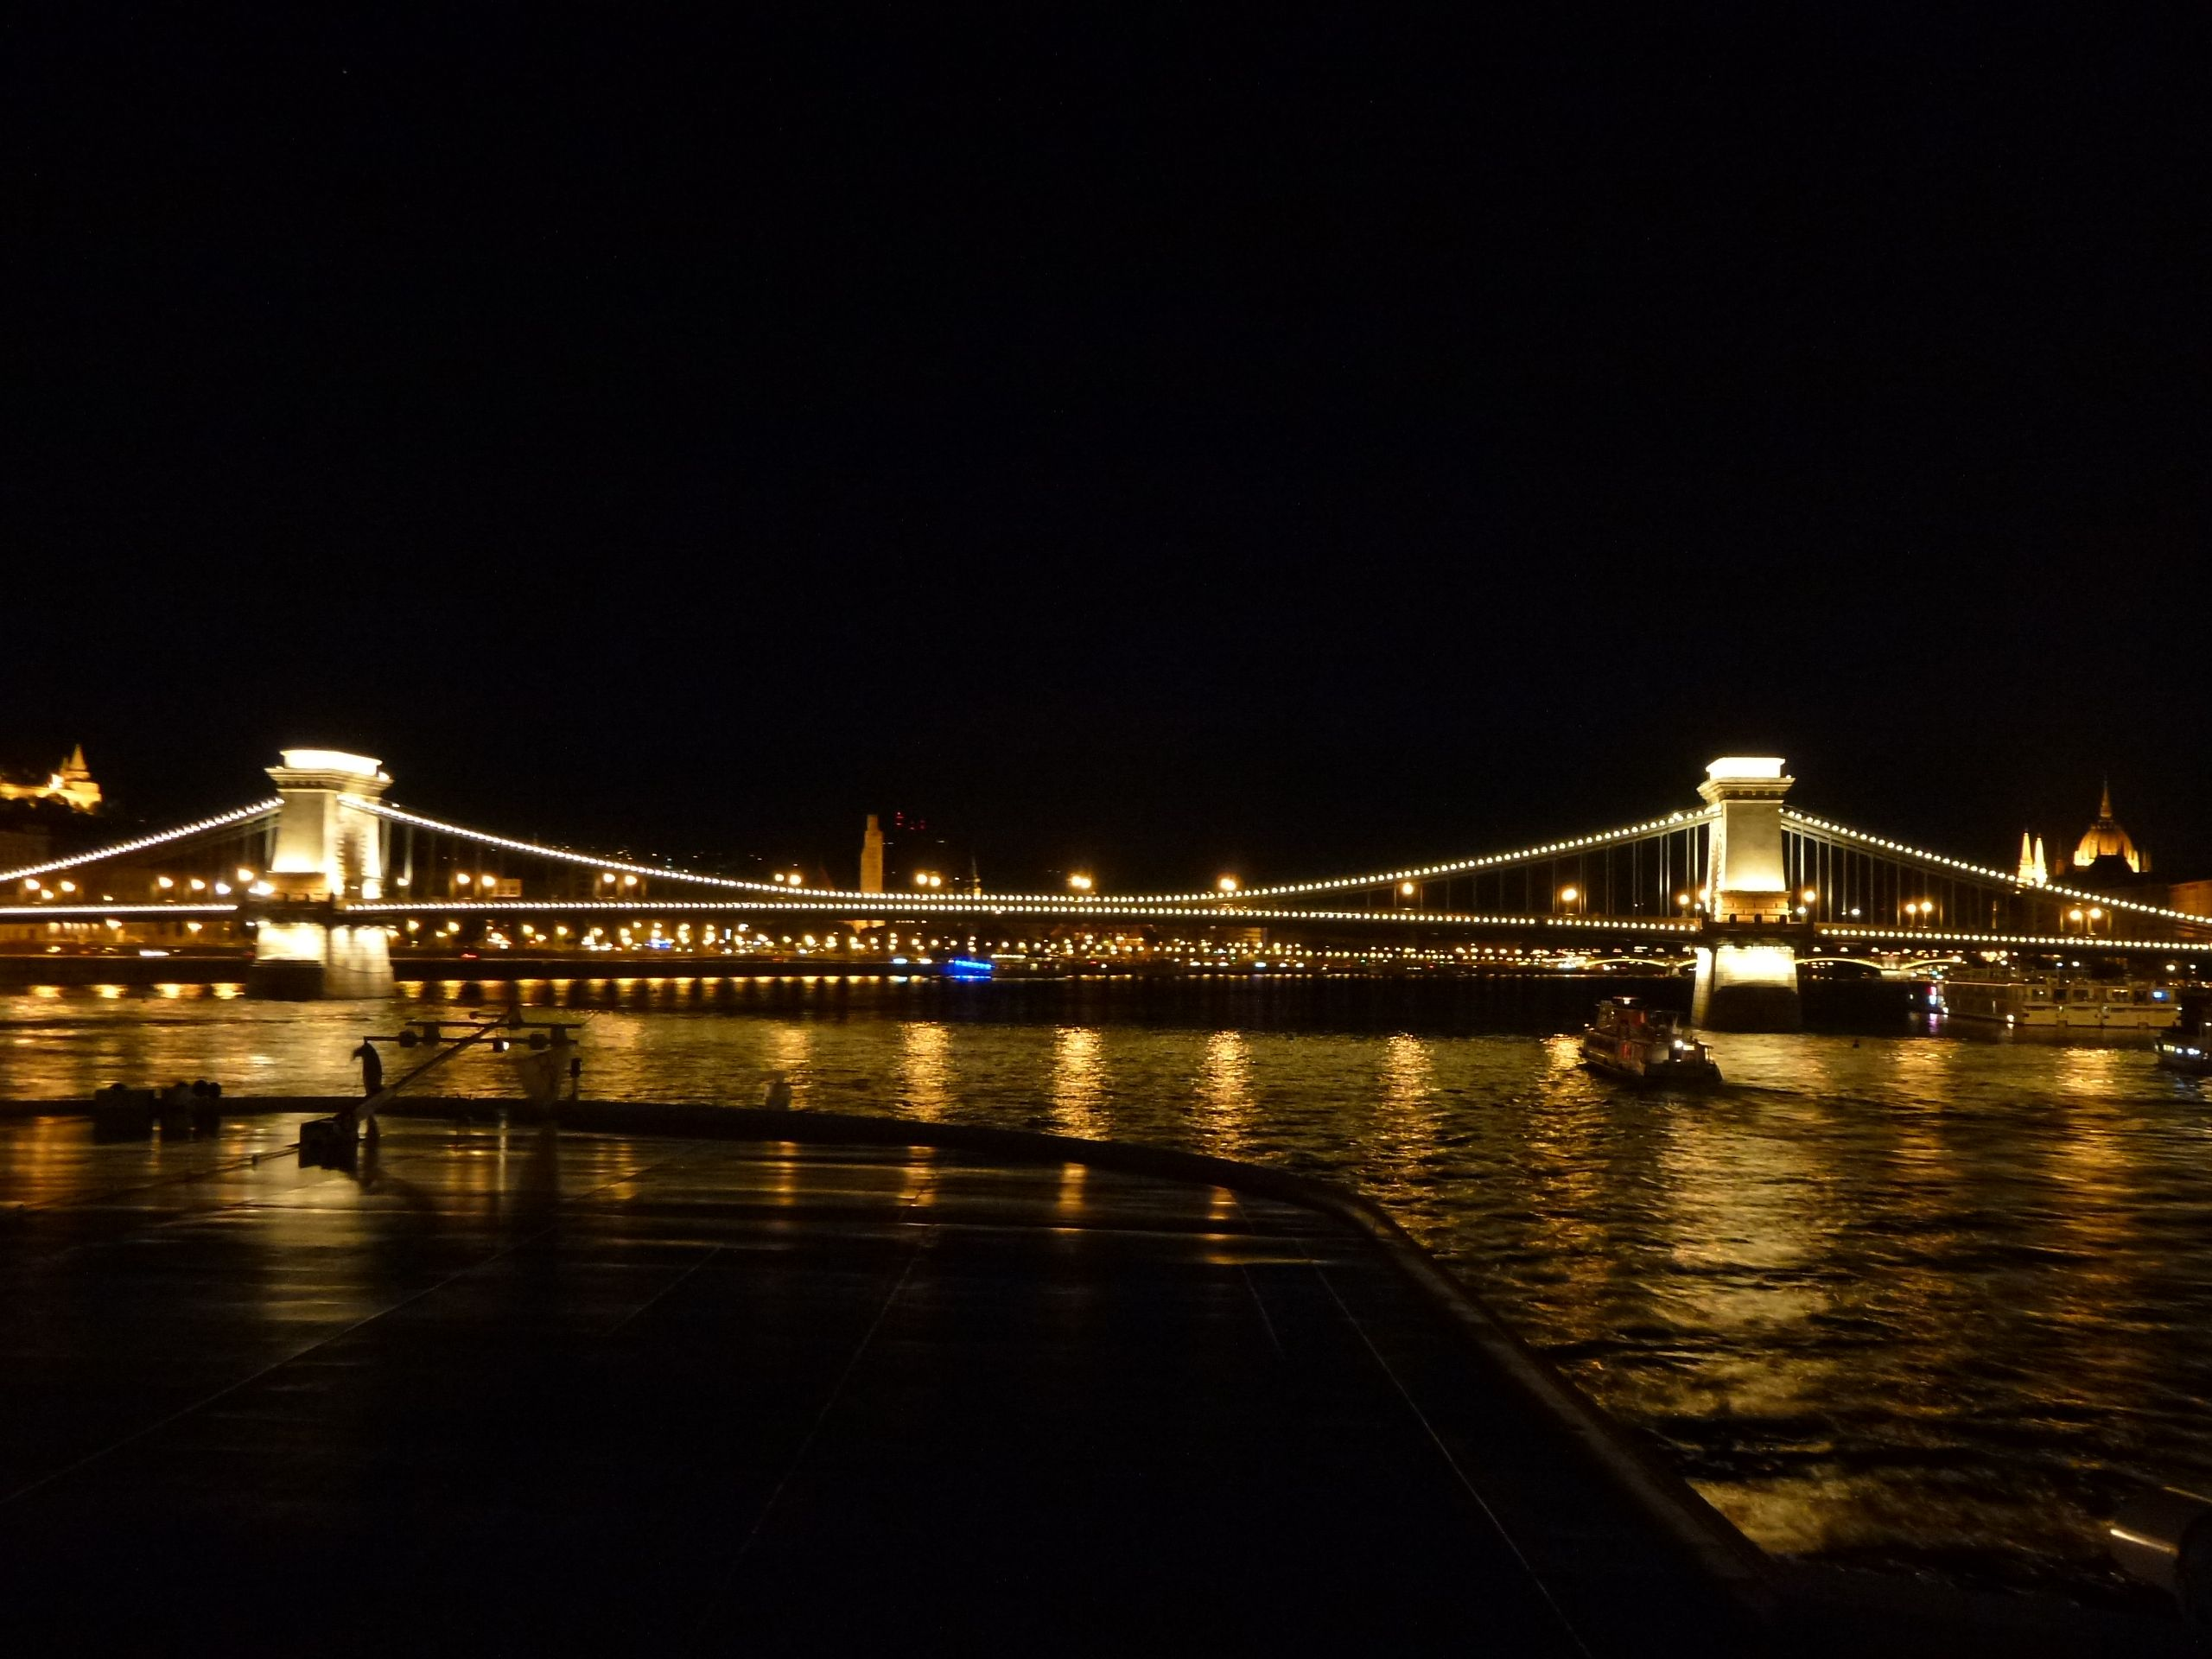 Danube River Cruise Ship    ||  DerTour Mozart   ||  Budapest, Hungary - Night Cruise - Chain bridge  ||  140510